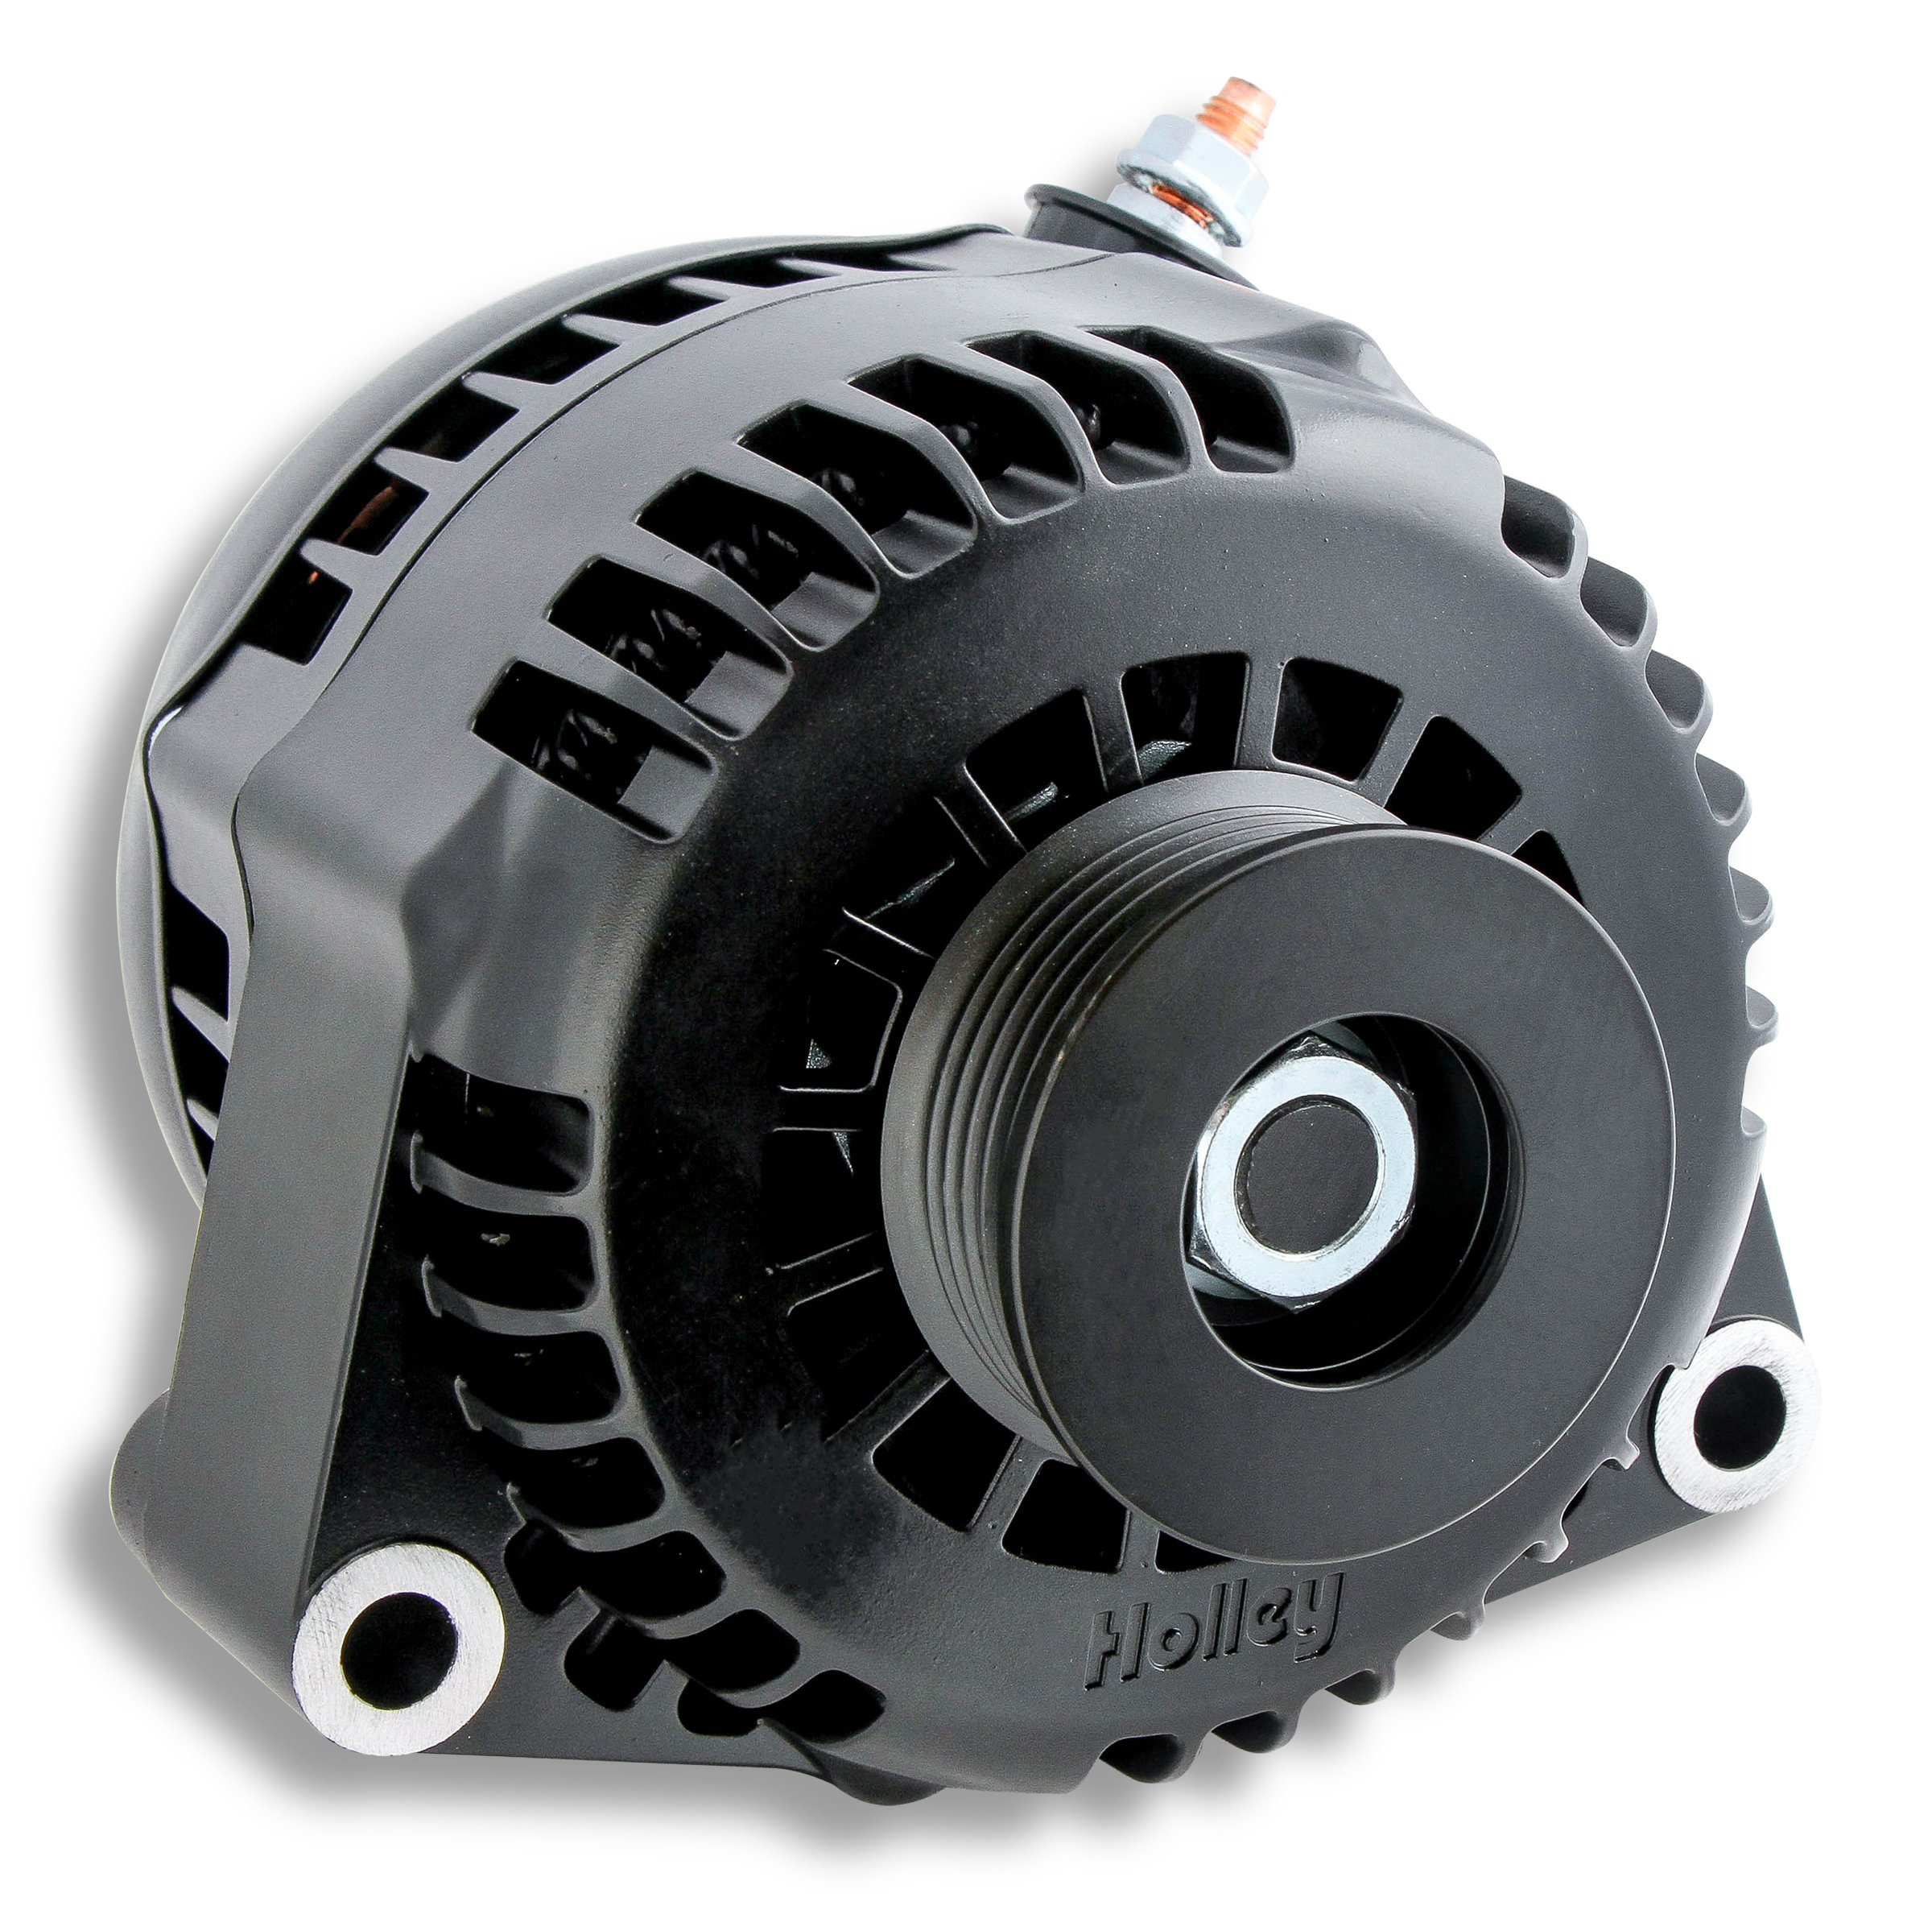 Holley Premium Alternator